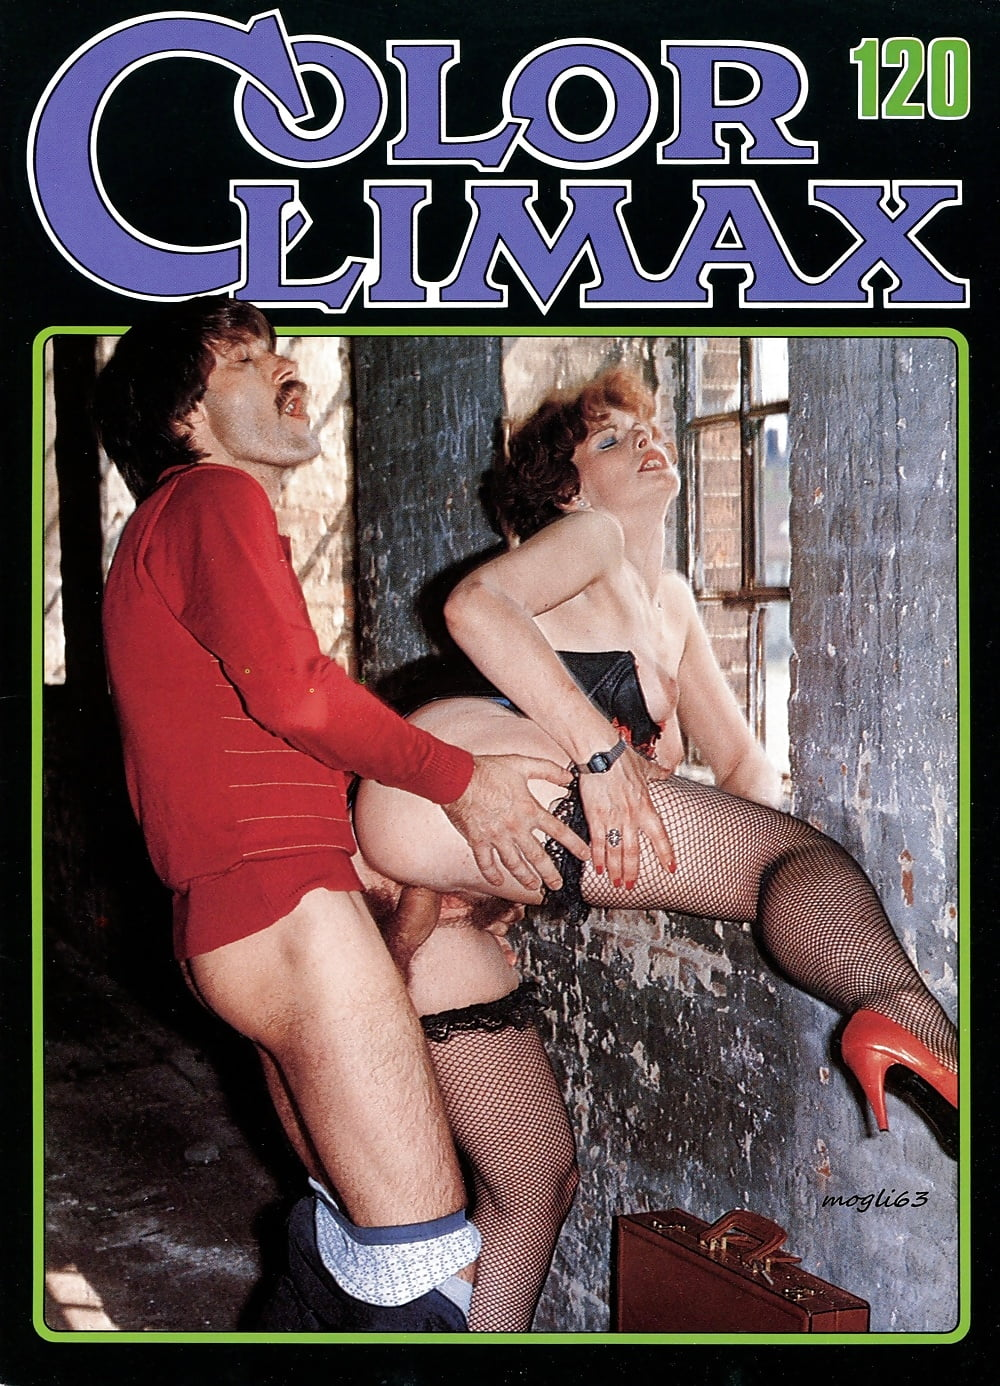 Color climax 1975